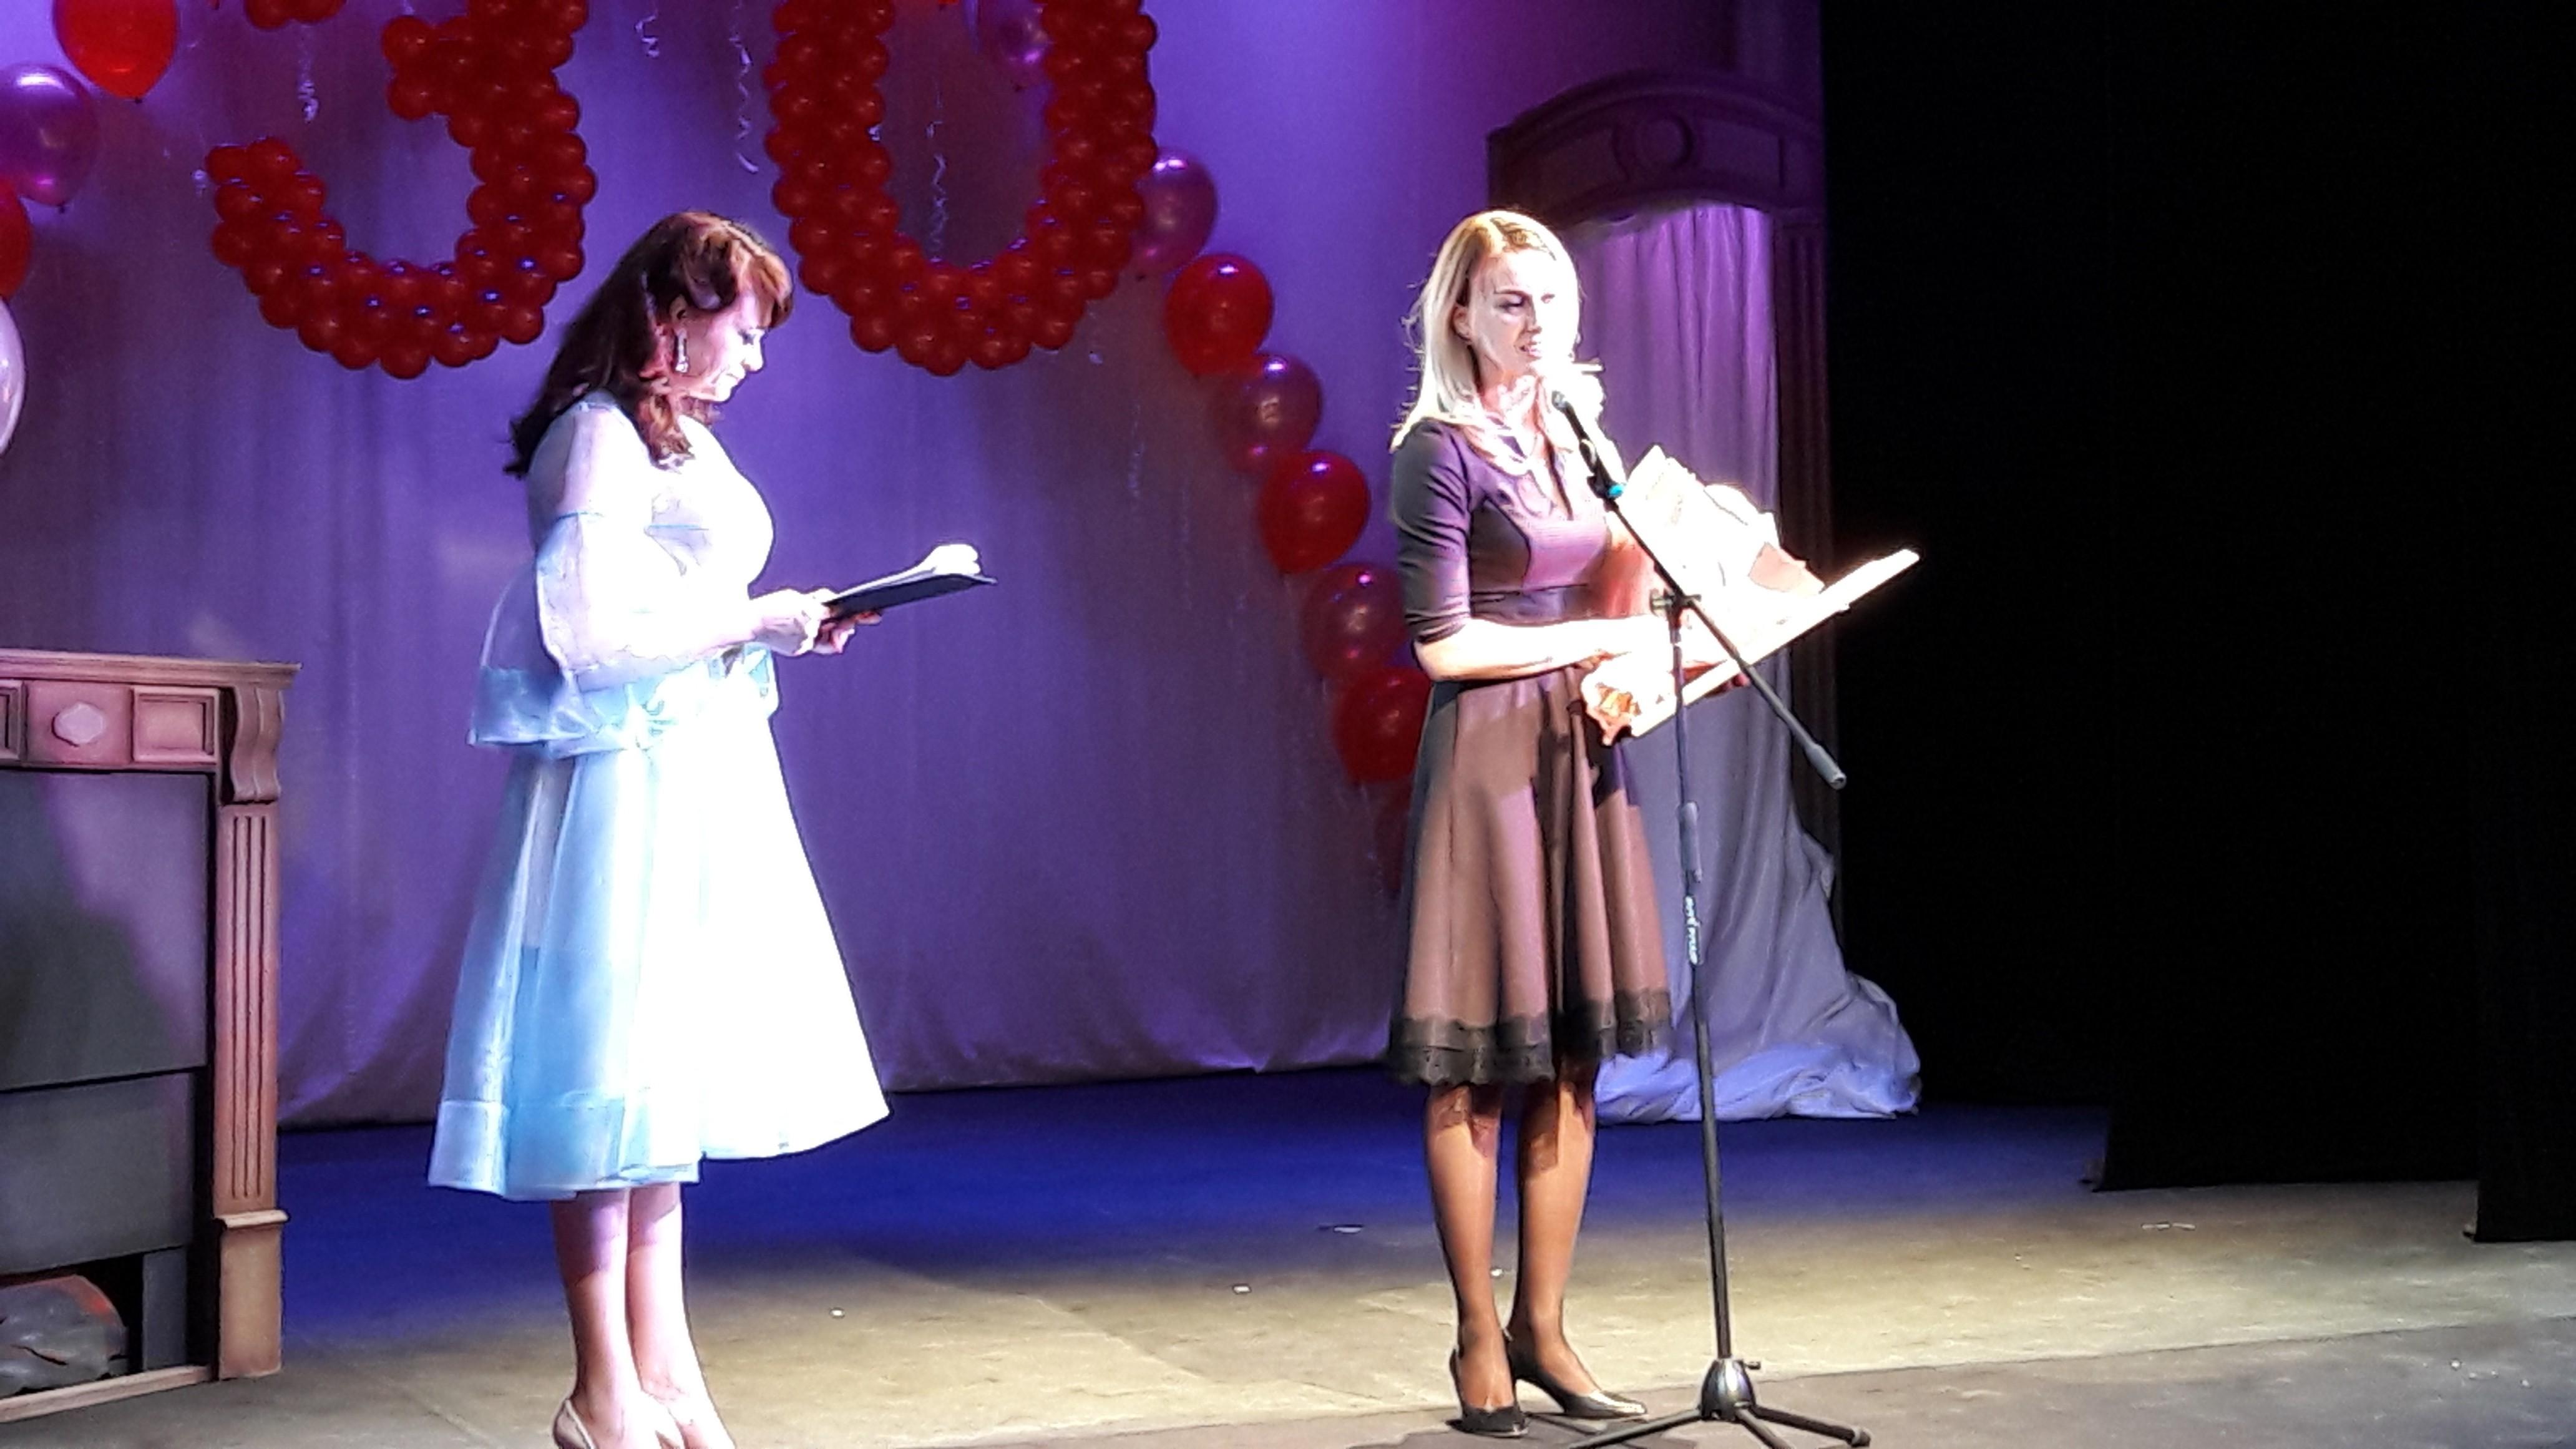 Театр Оперы и Балета поздравил коллег из театра кукол